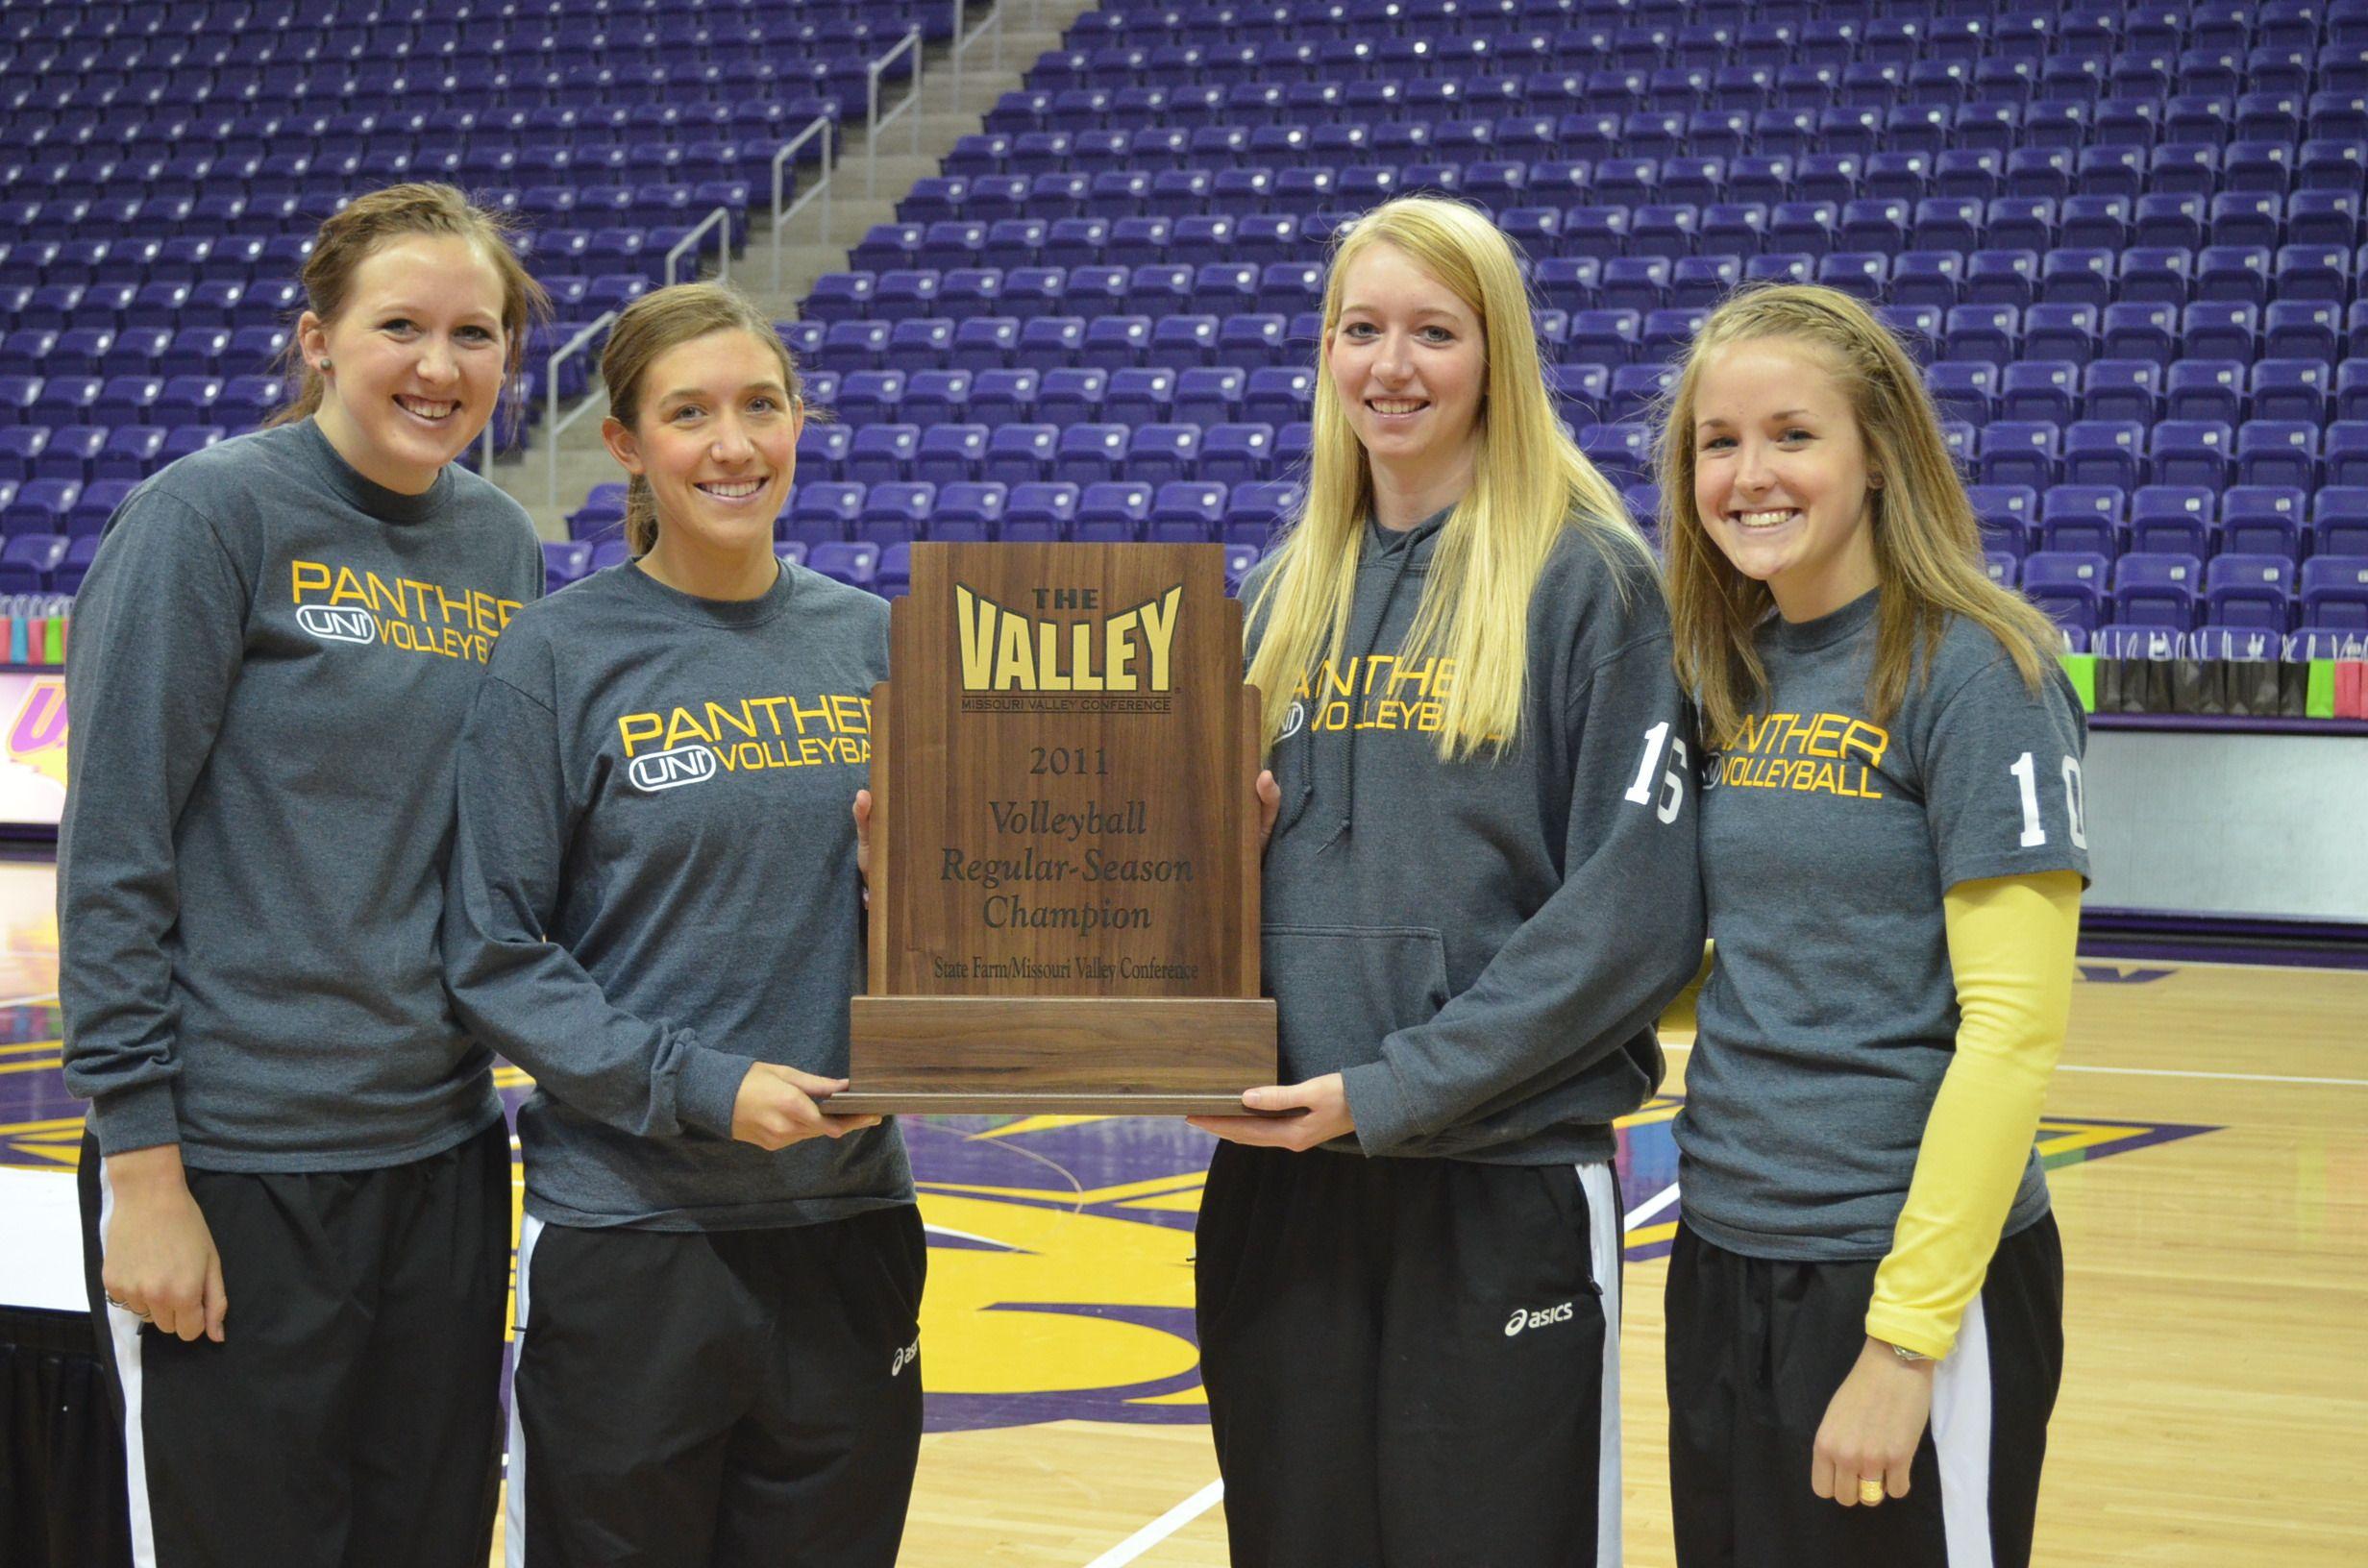 2011 Volleyball Regular Season Champions Northern Iowa Northern Iowa Iowa Champion